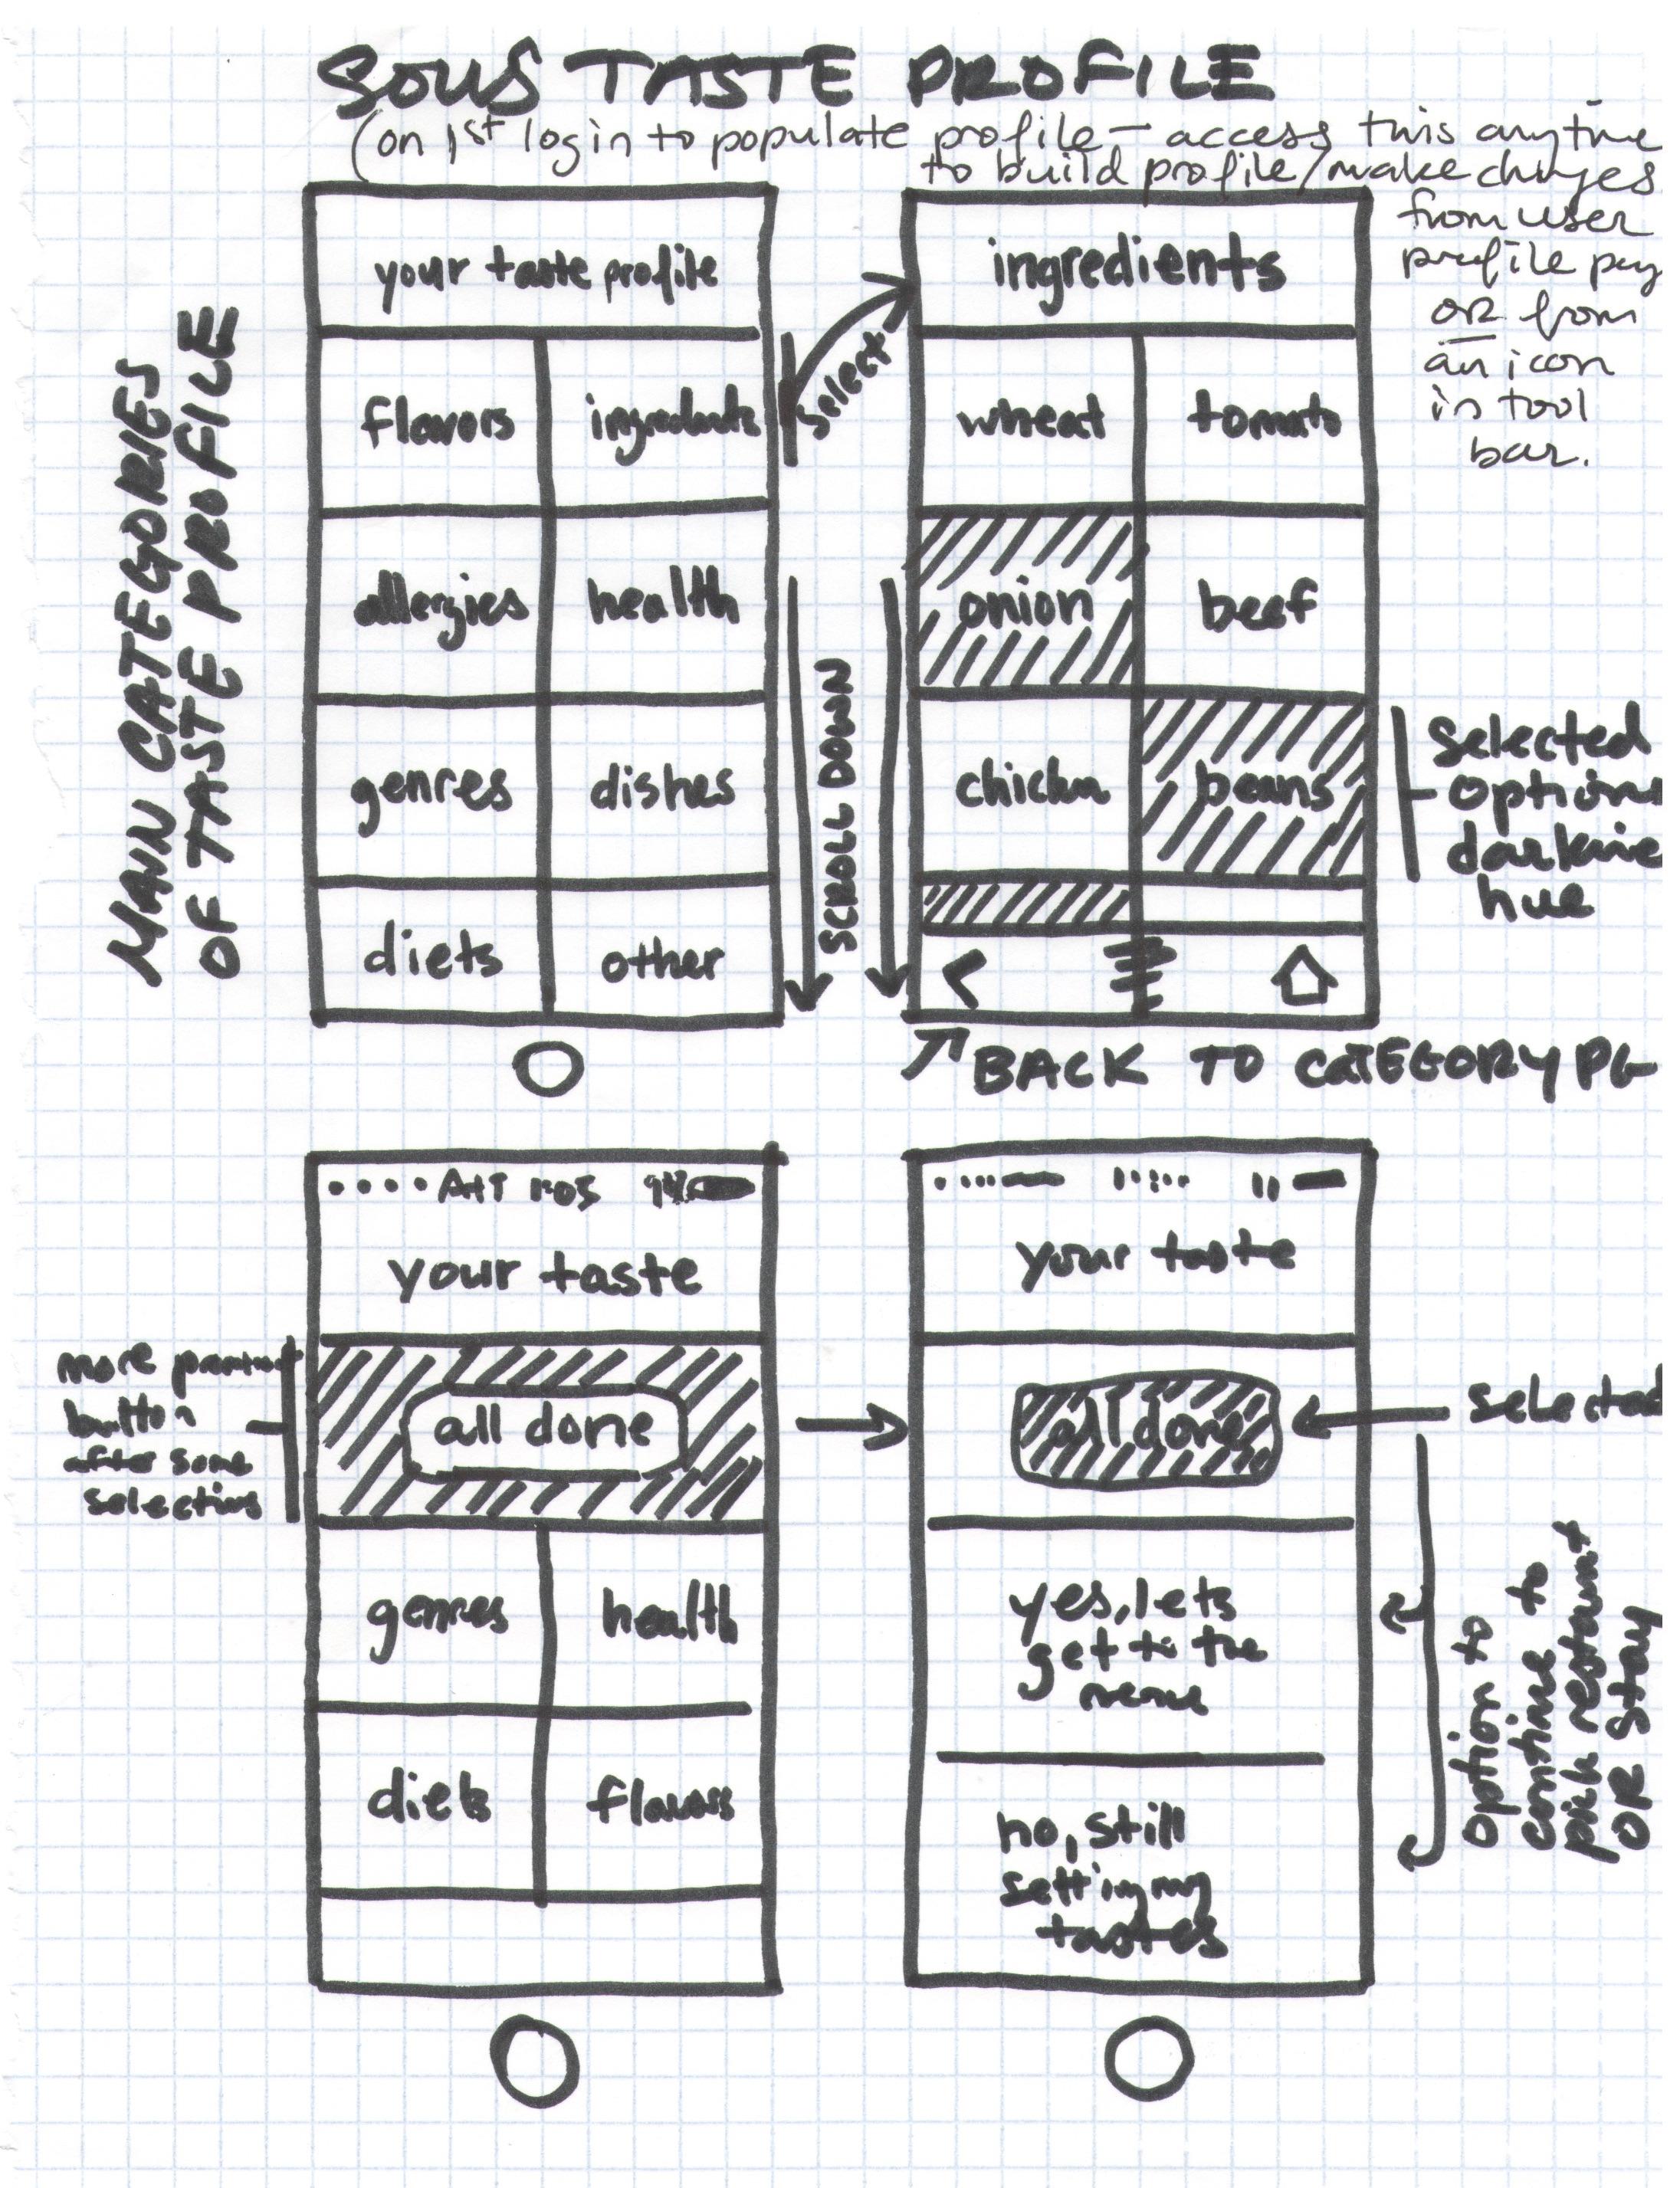 sous wireframe taste profile sketch.jpg